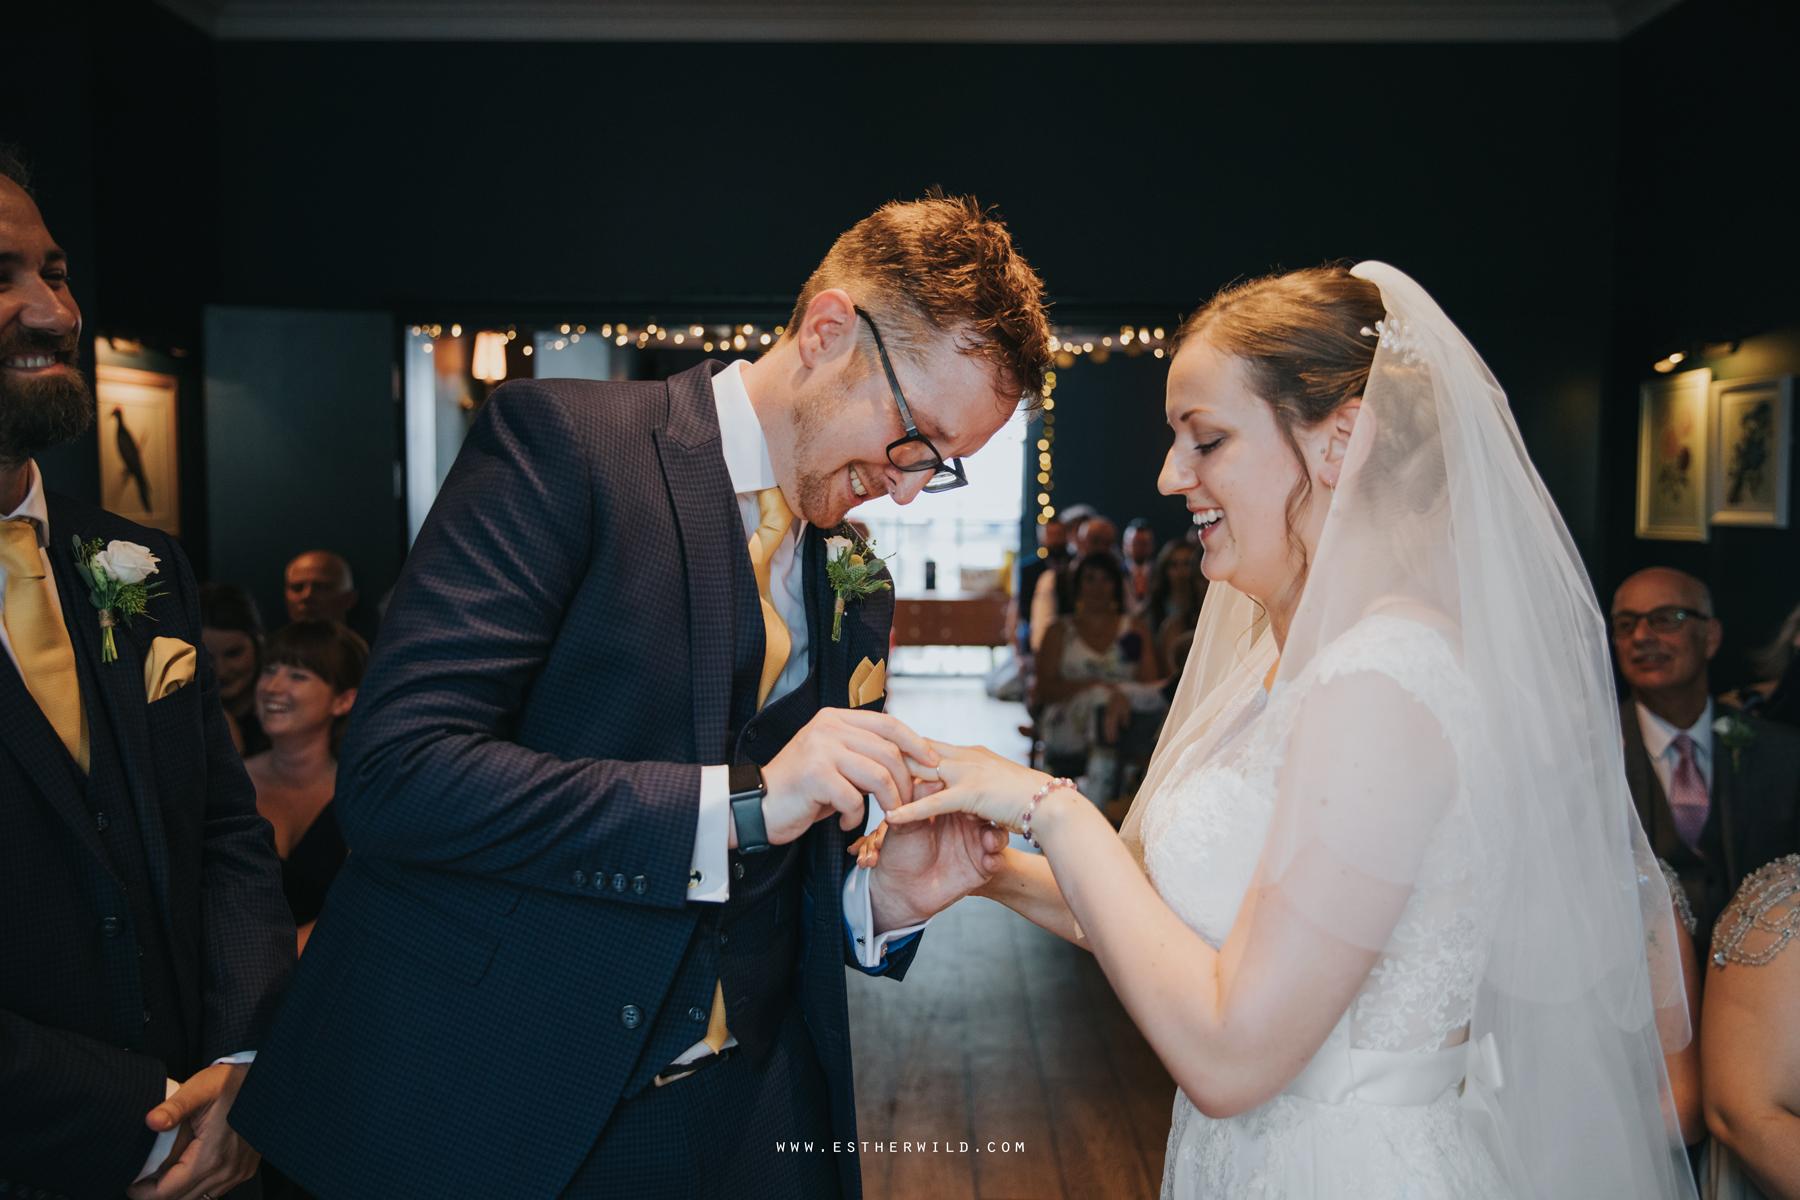 The_Georgian_Townhouse_Wedding_Norwich_Esther_Wild_Photographer_3R8A1031.jpg